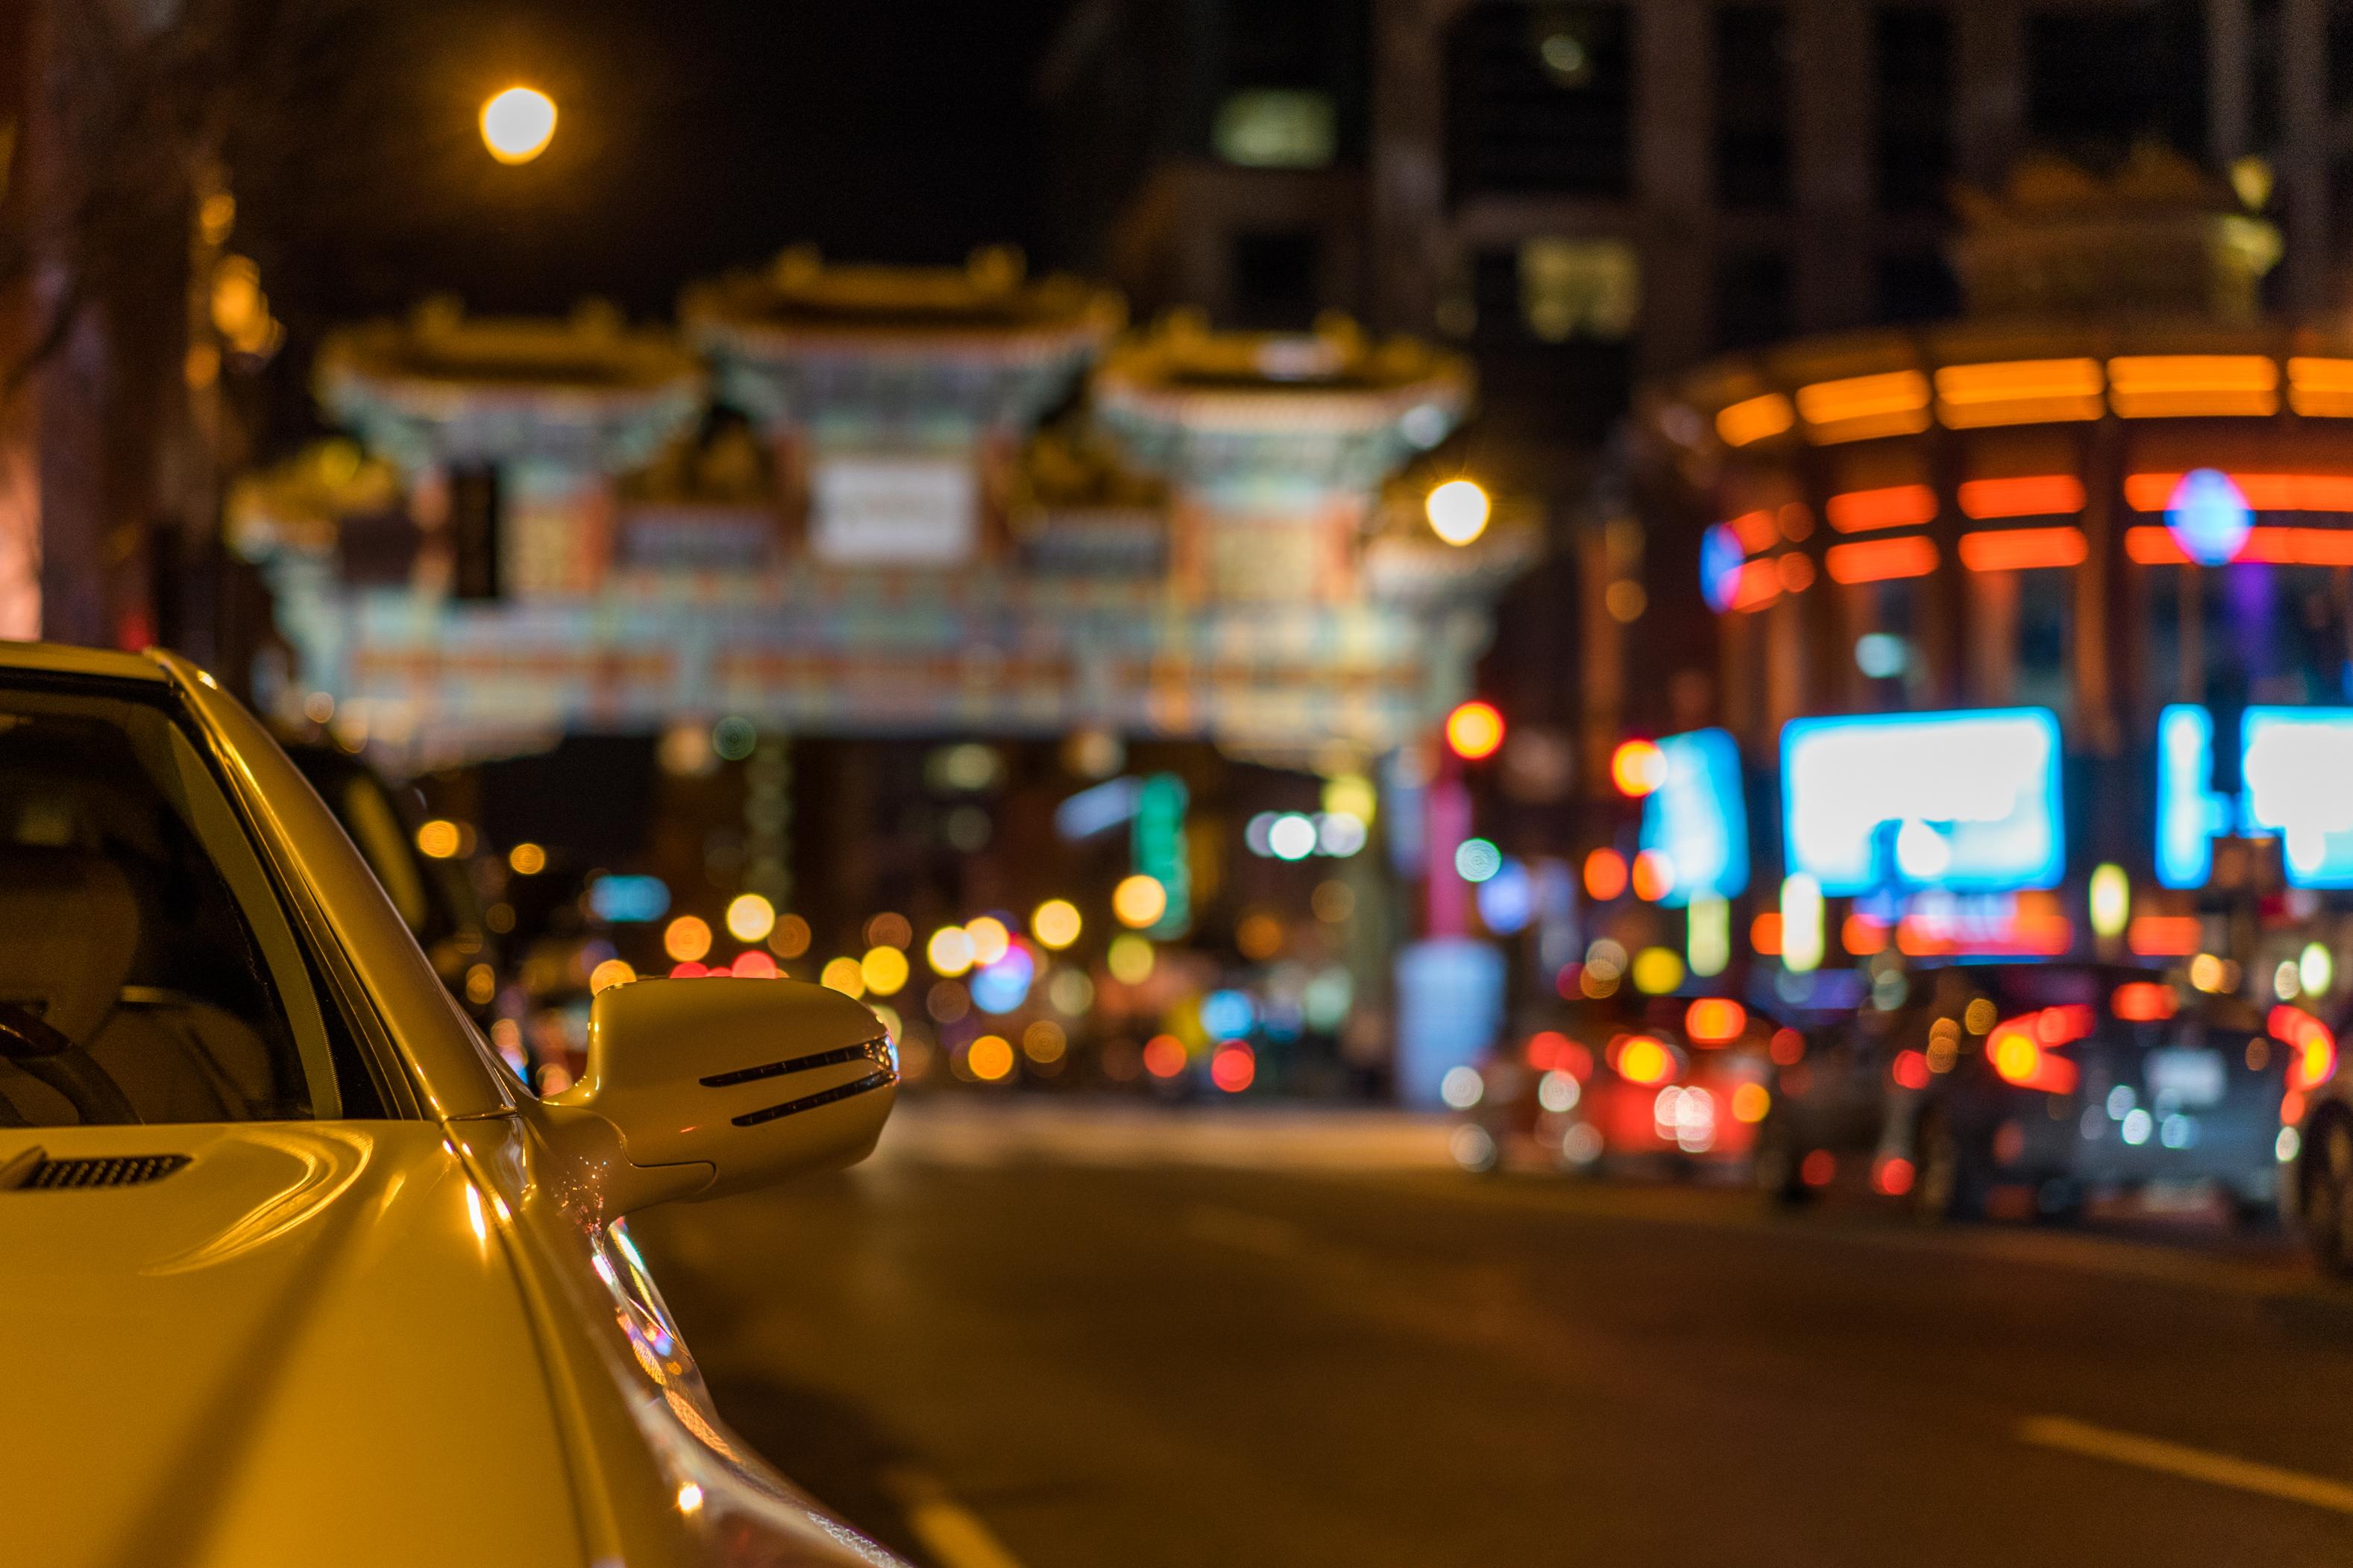 Wallpaper : lights, city, street, cityscape, night, car